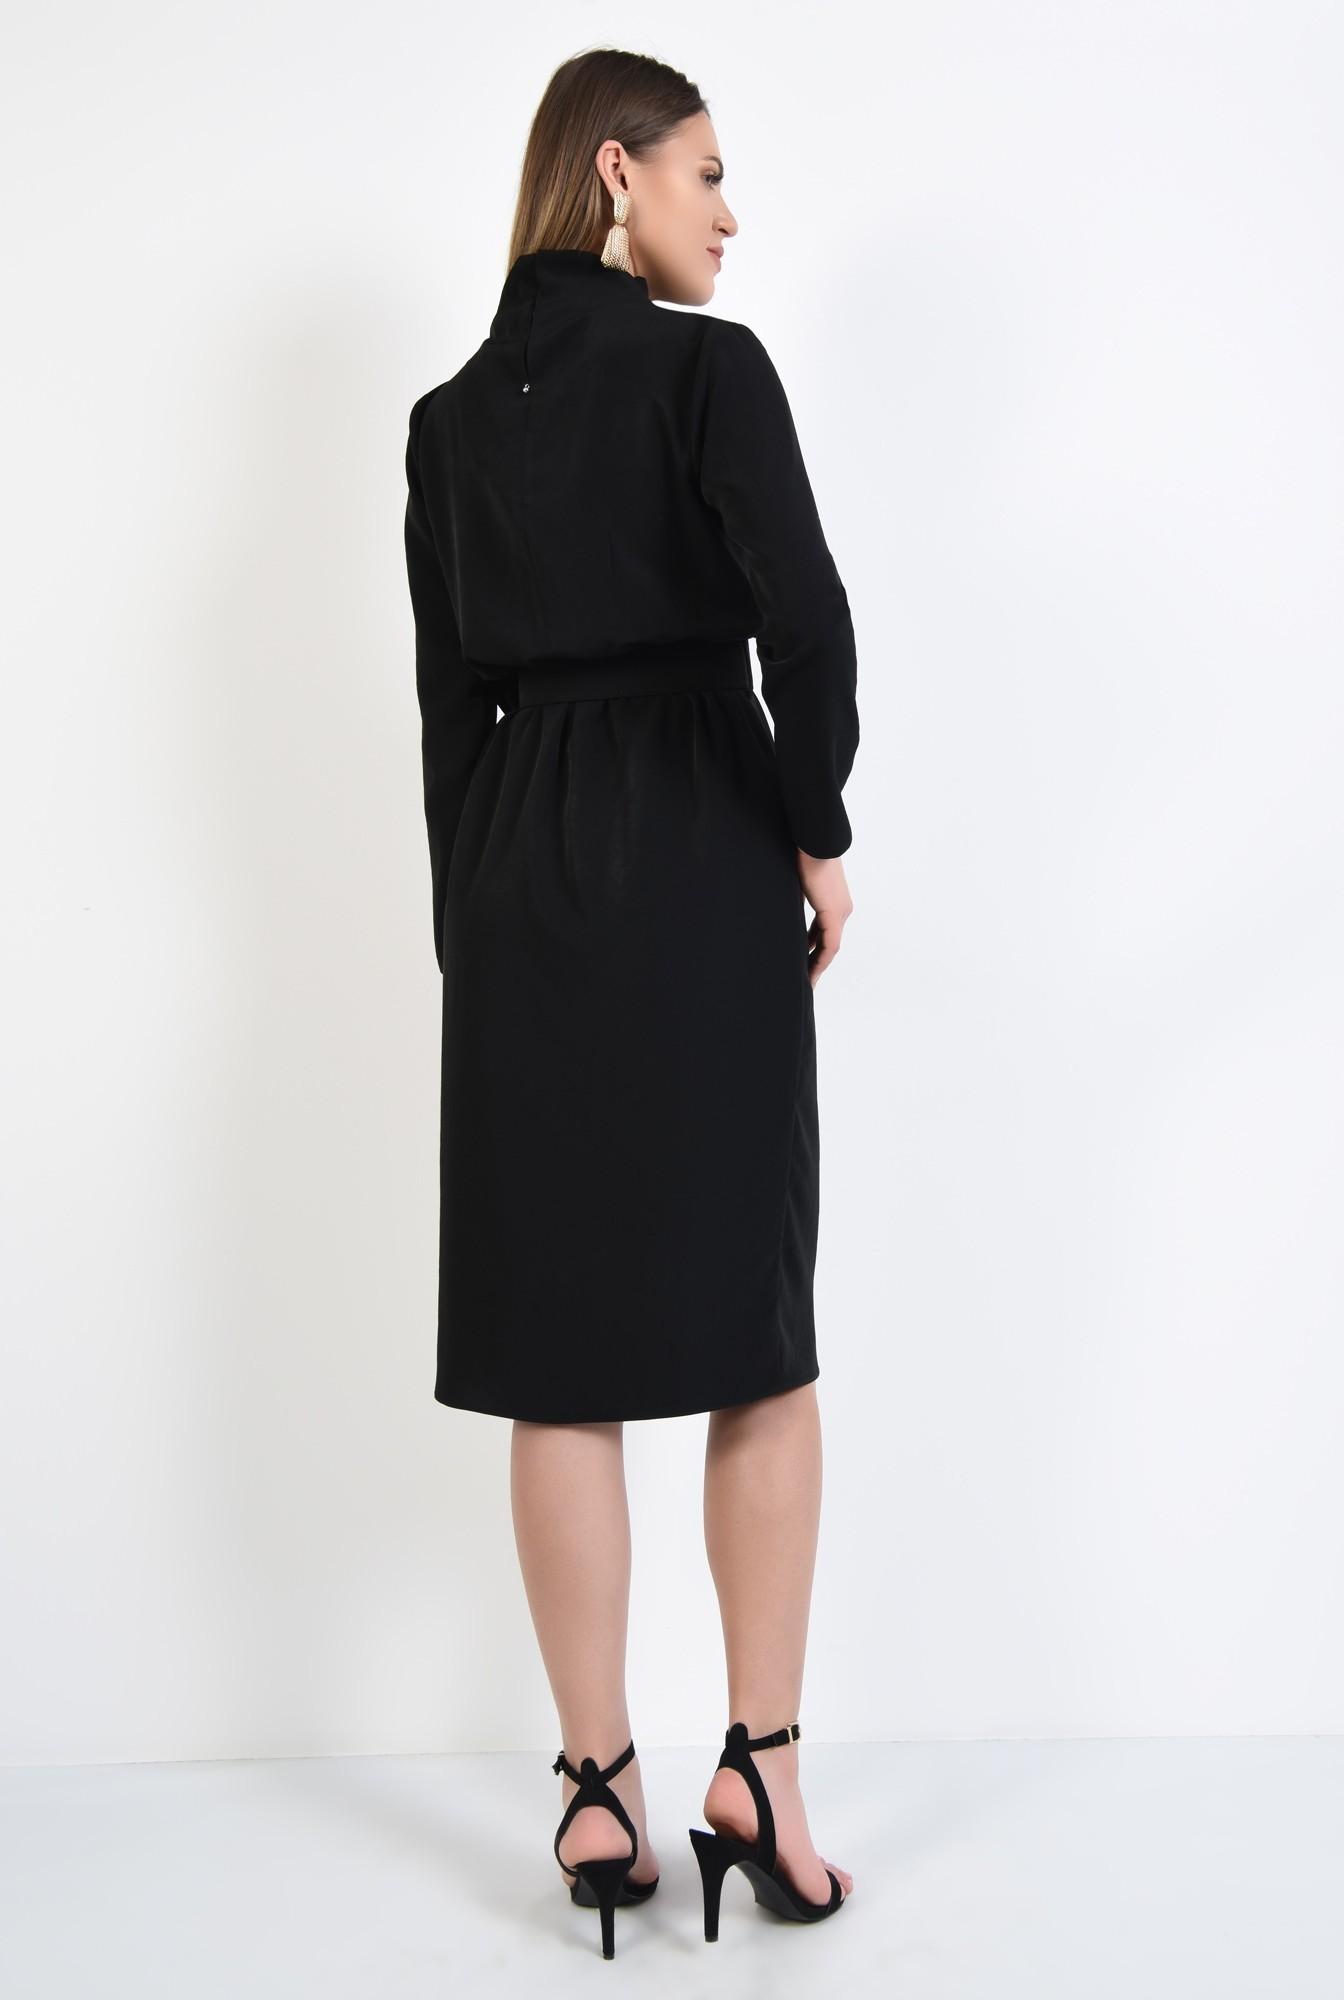 1 - rochie neagra, de zi, croi cambrat cu elastic, maneci lungi